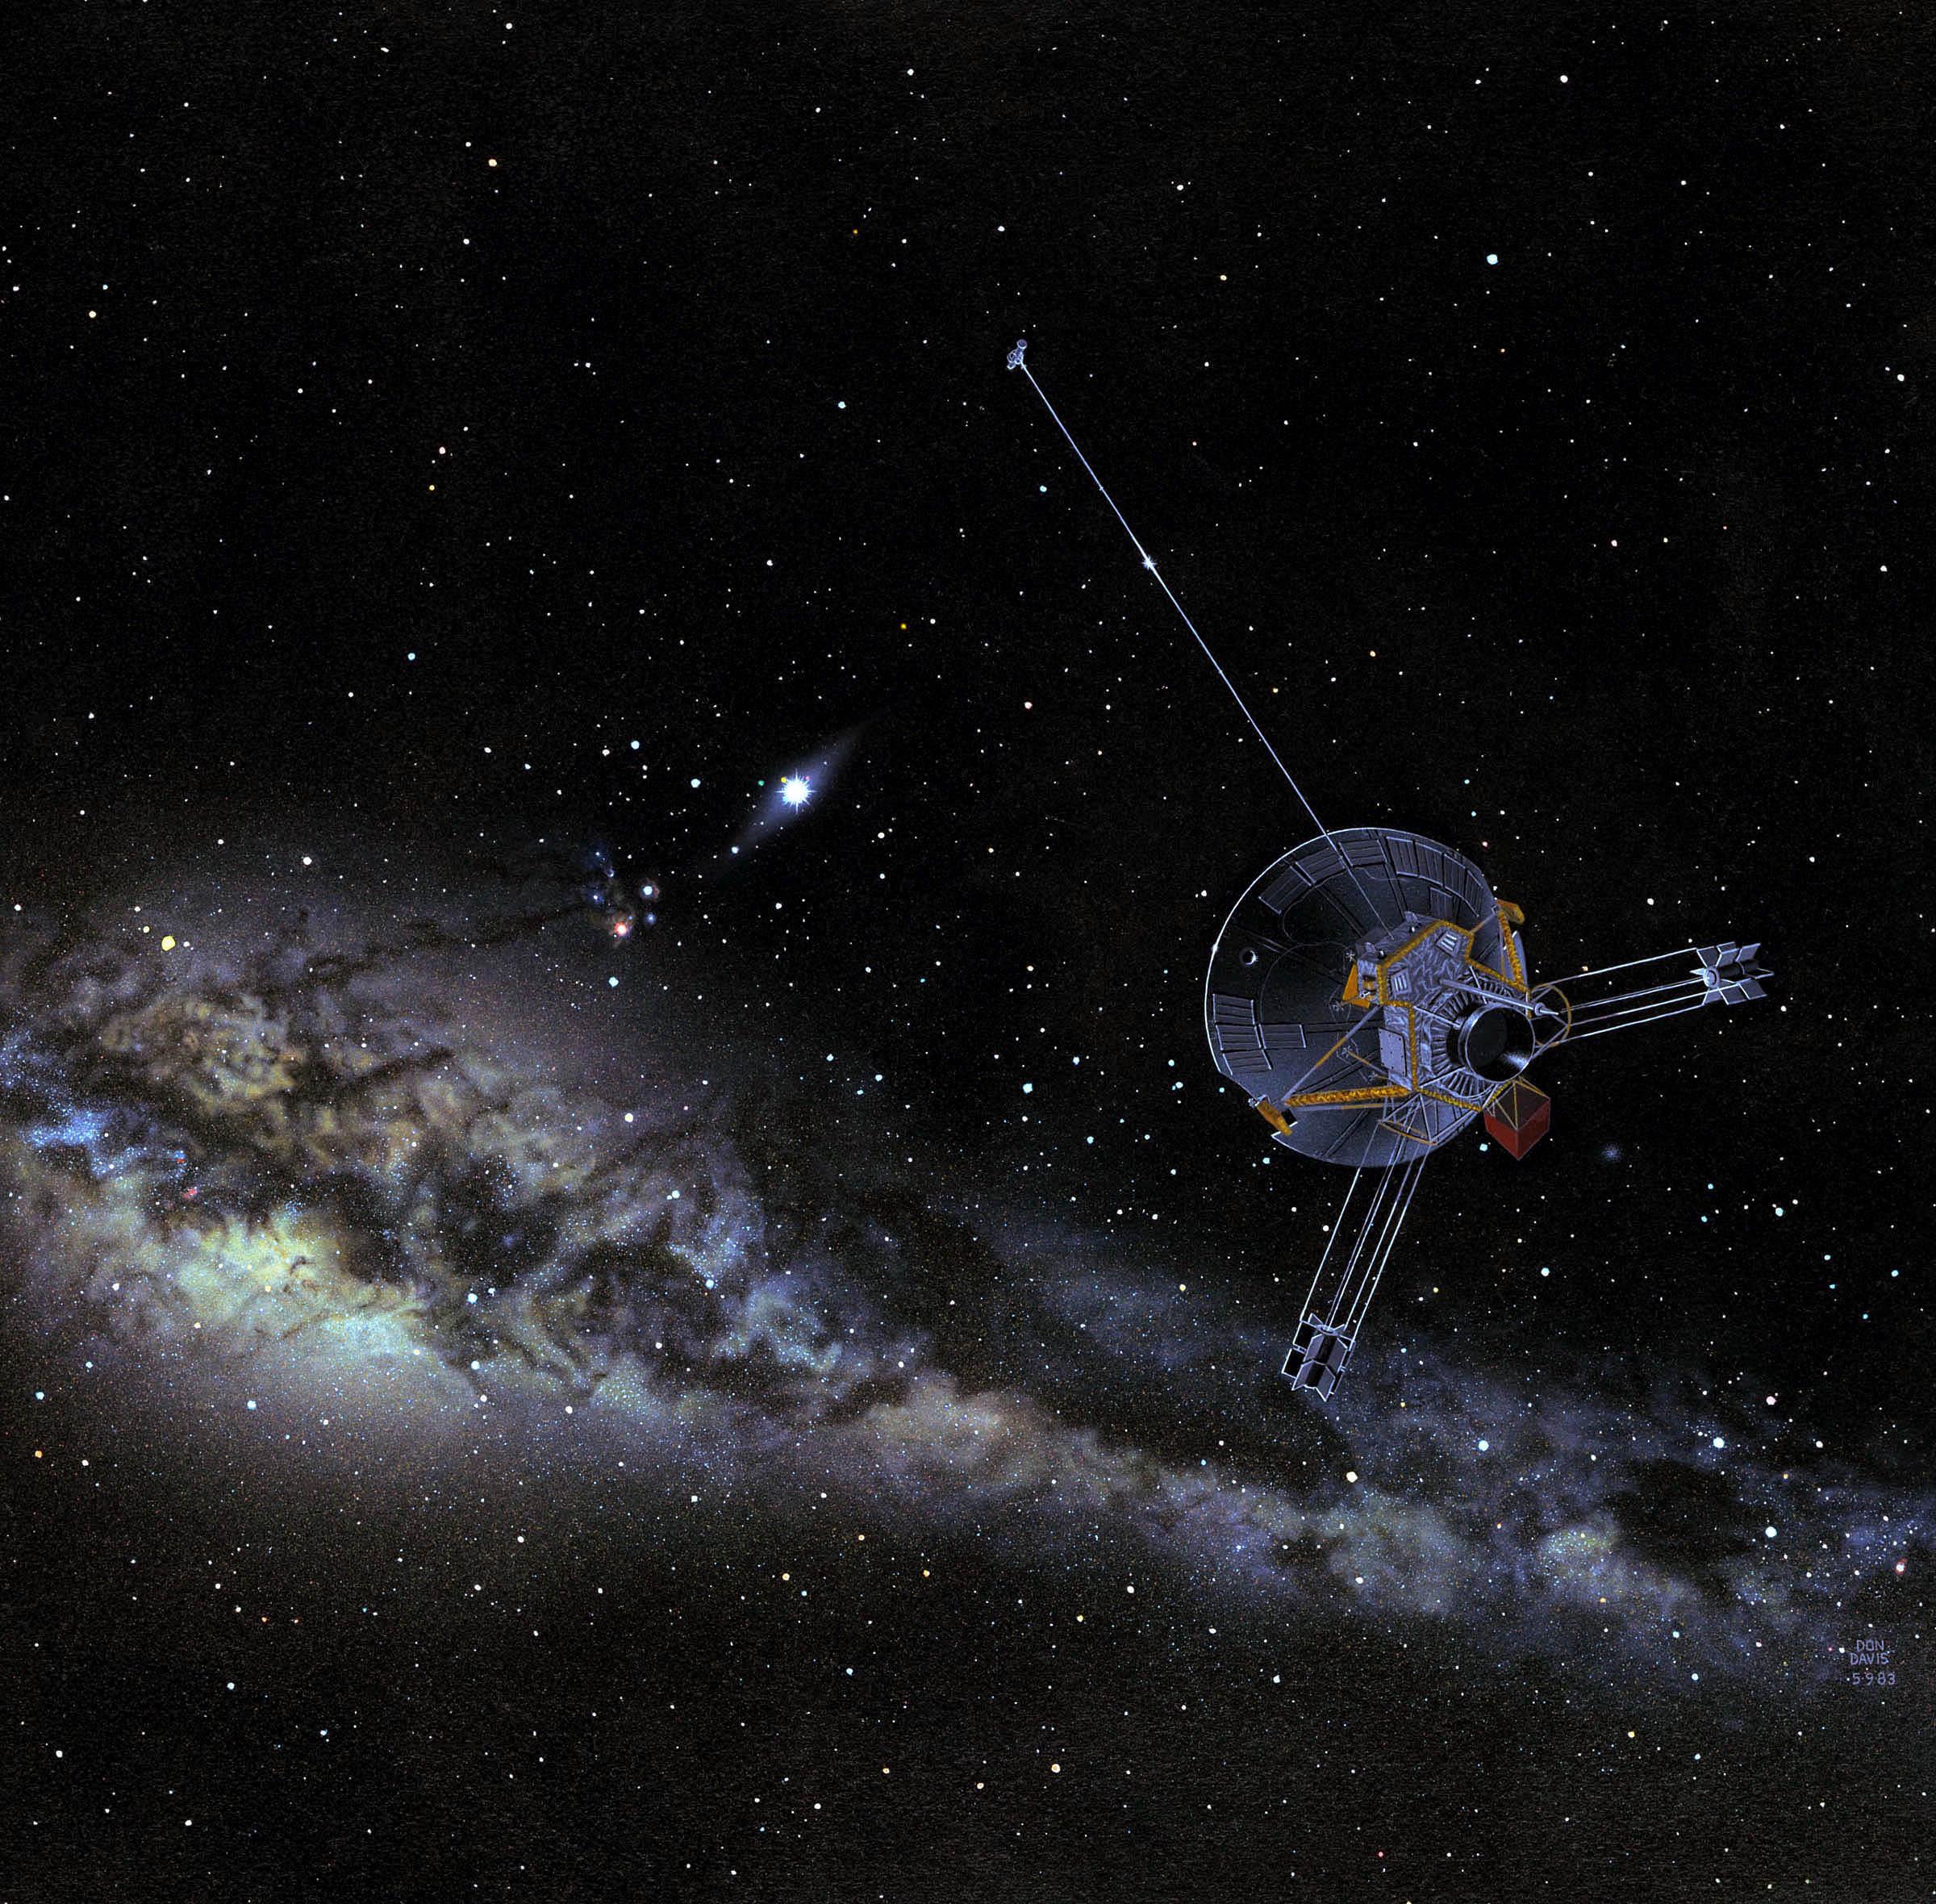 Sonda espacial Pionner